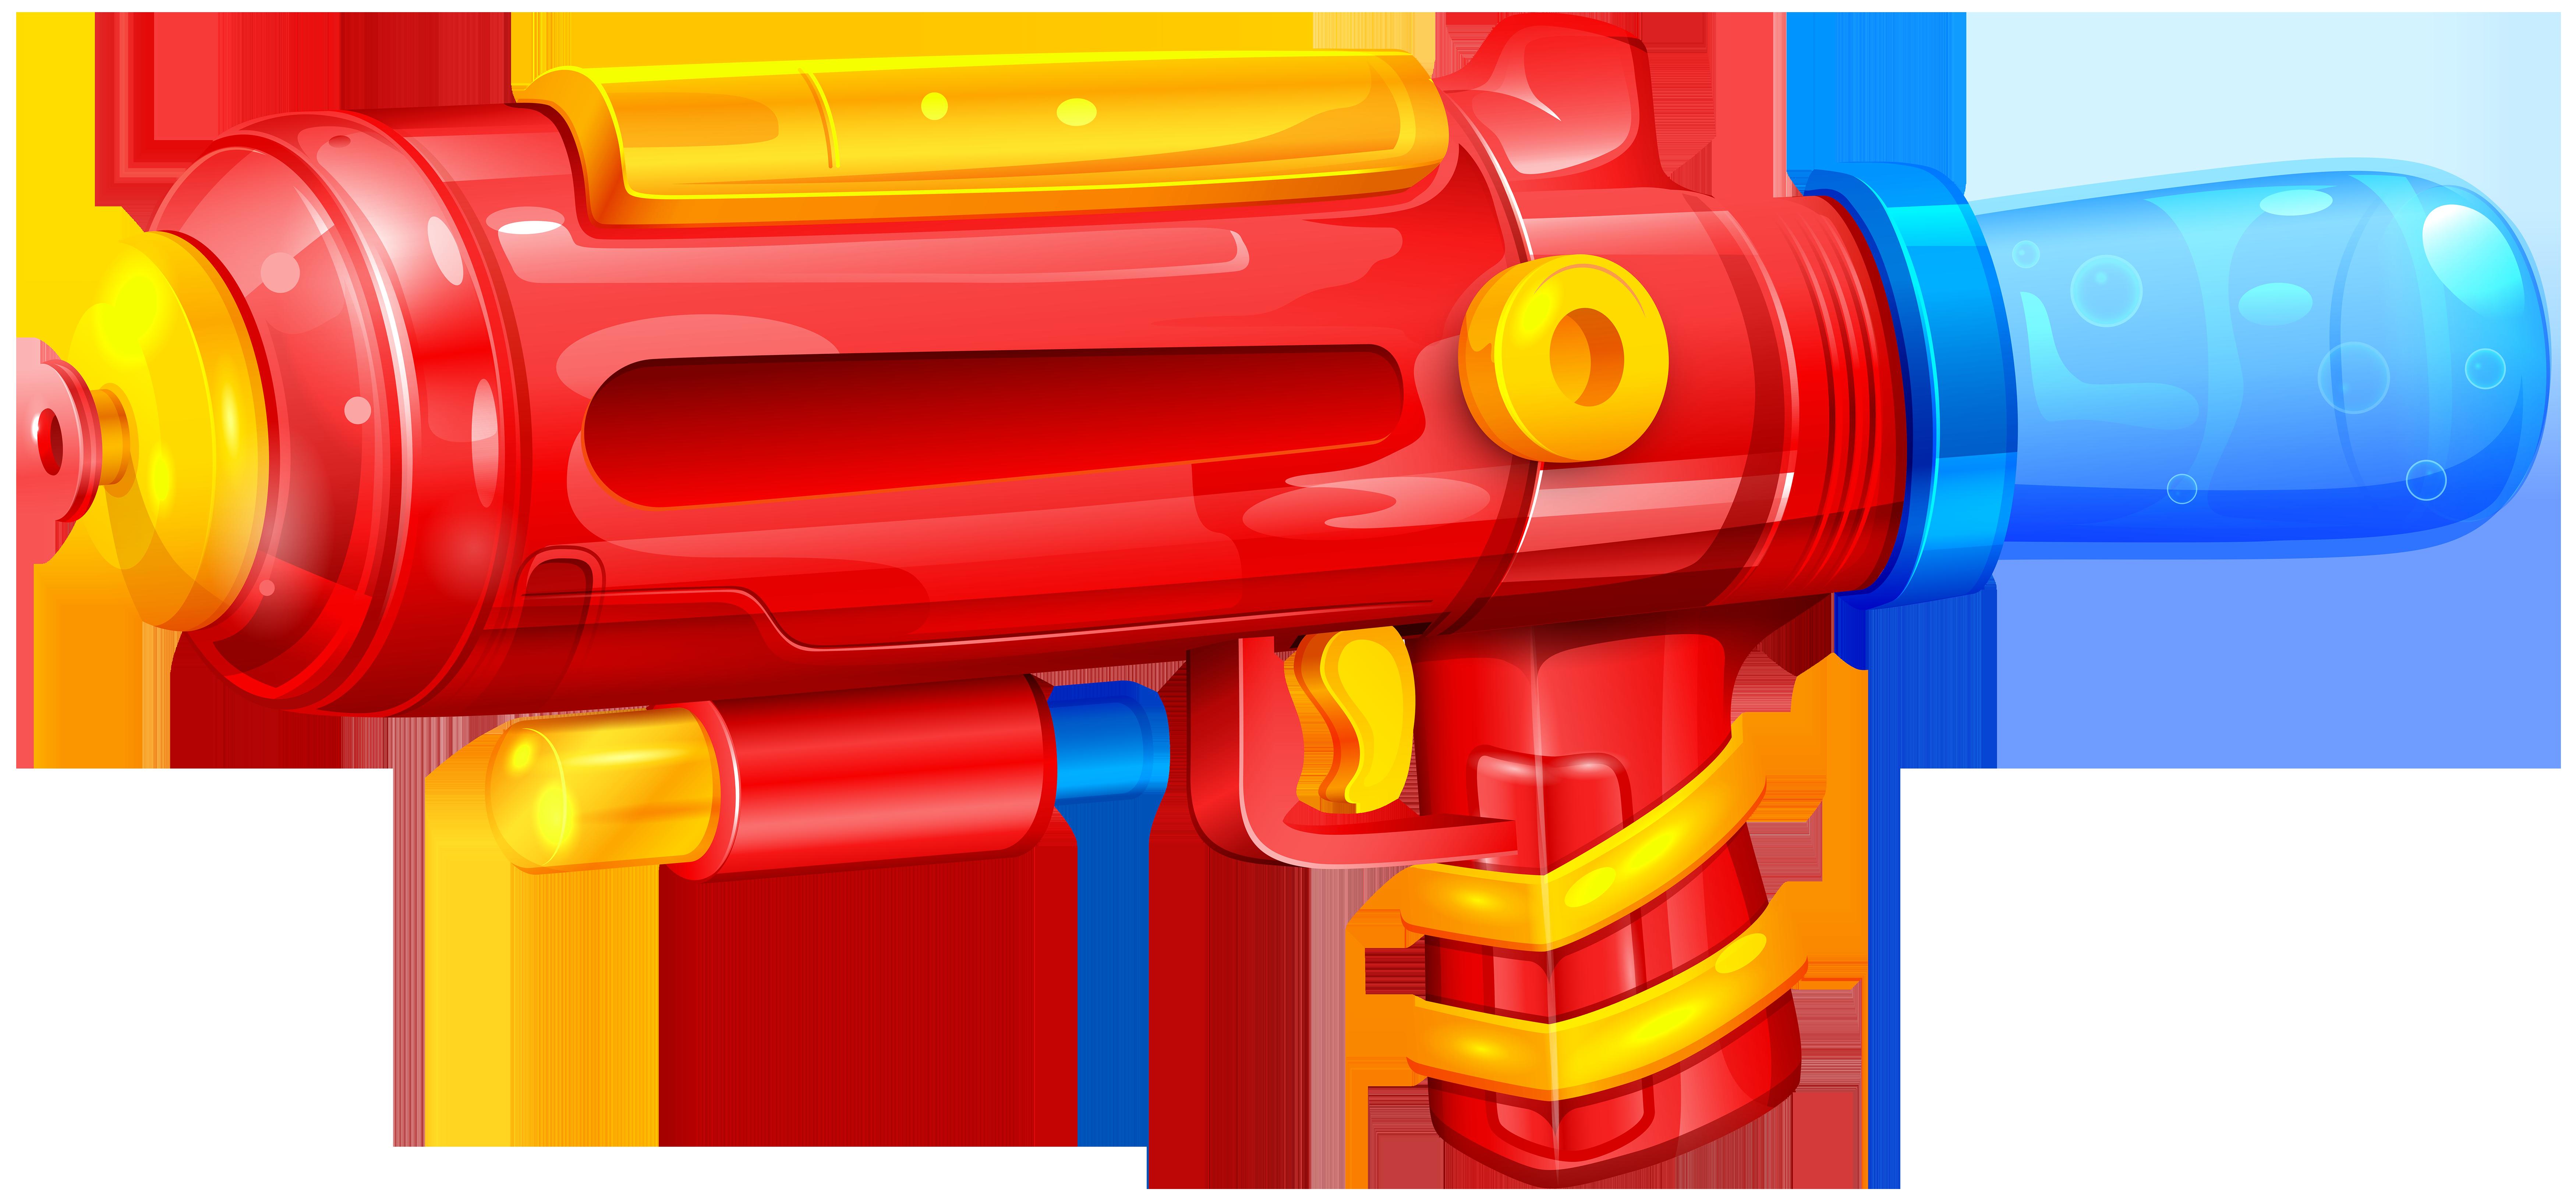 Laser clipart water pistol #7